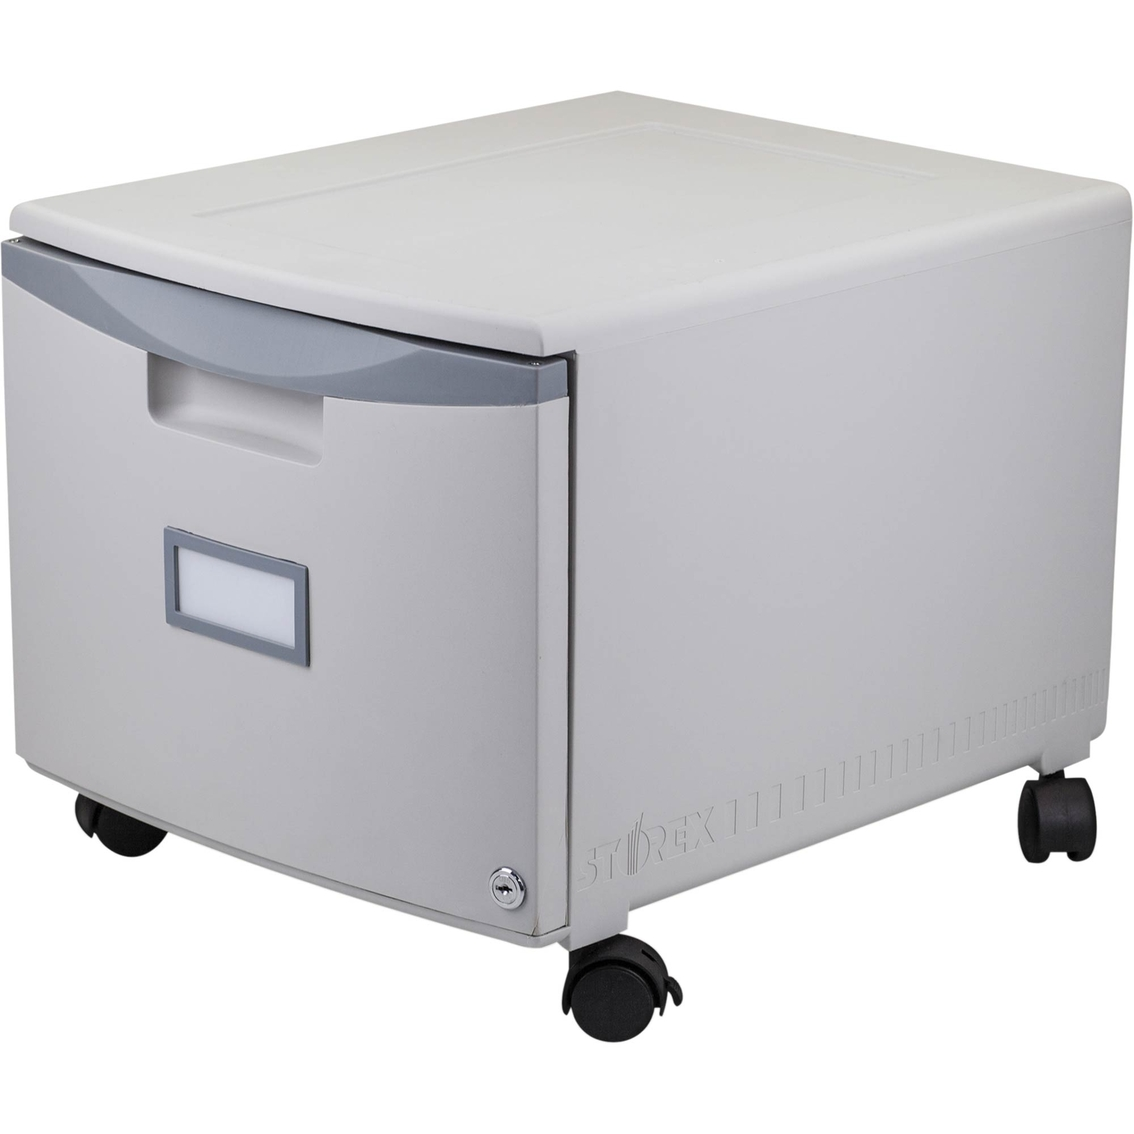 Storex Single Drawer Mobile Filing Cabinet File Cabinets